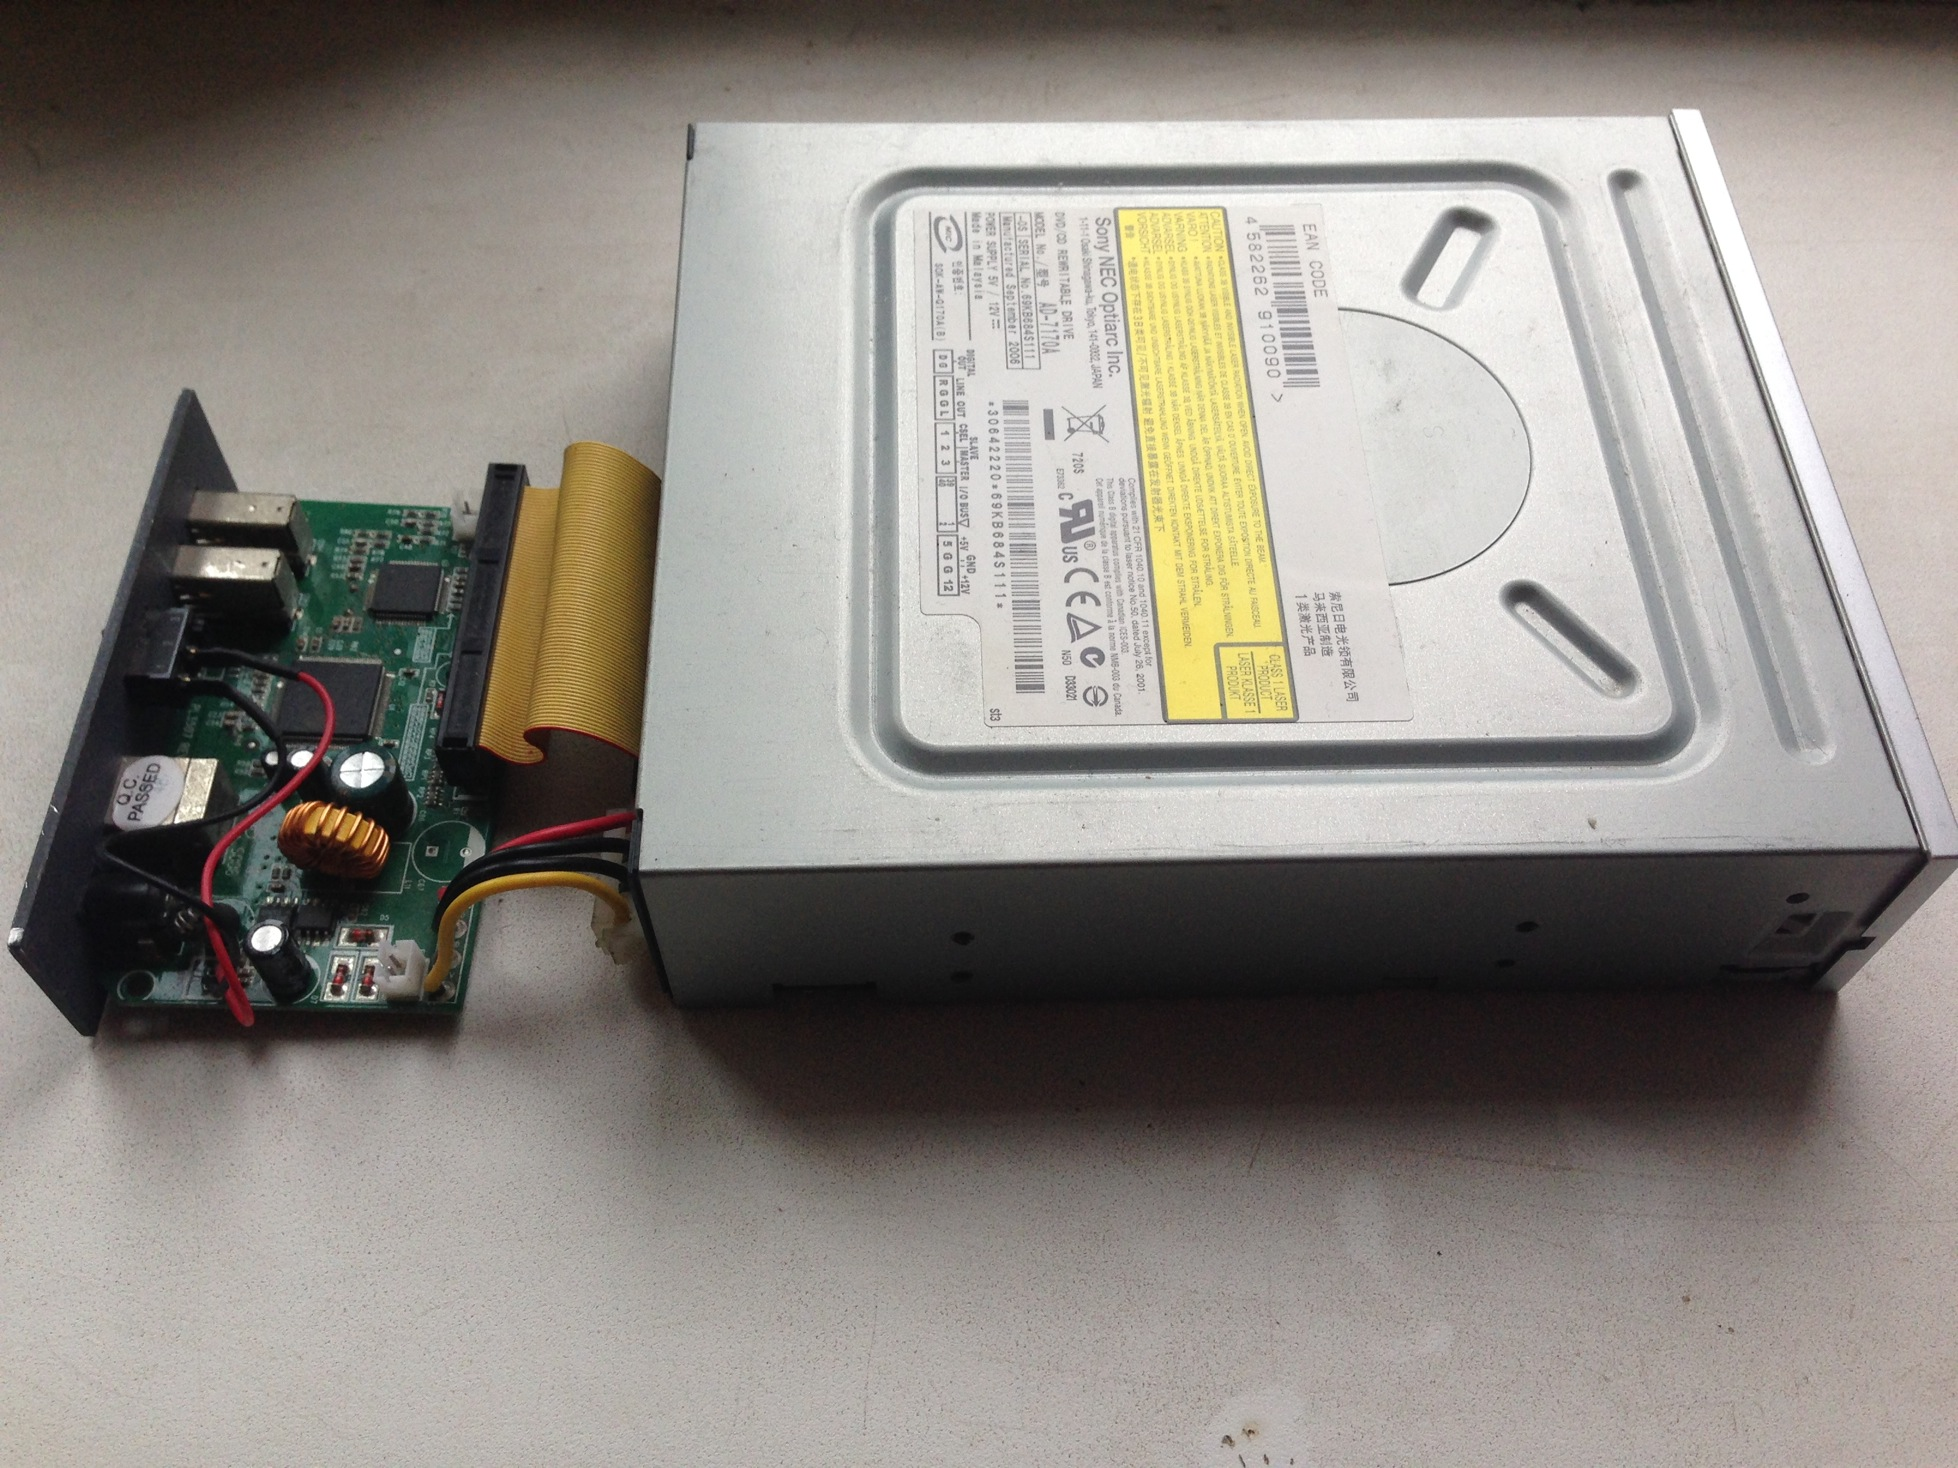 External optical disk drive from the external HDD drive